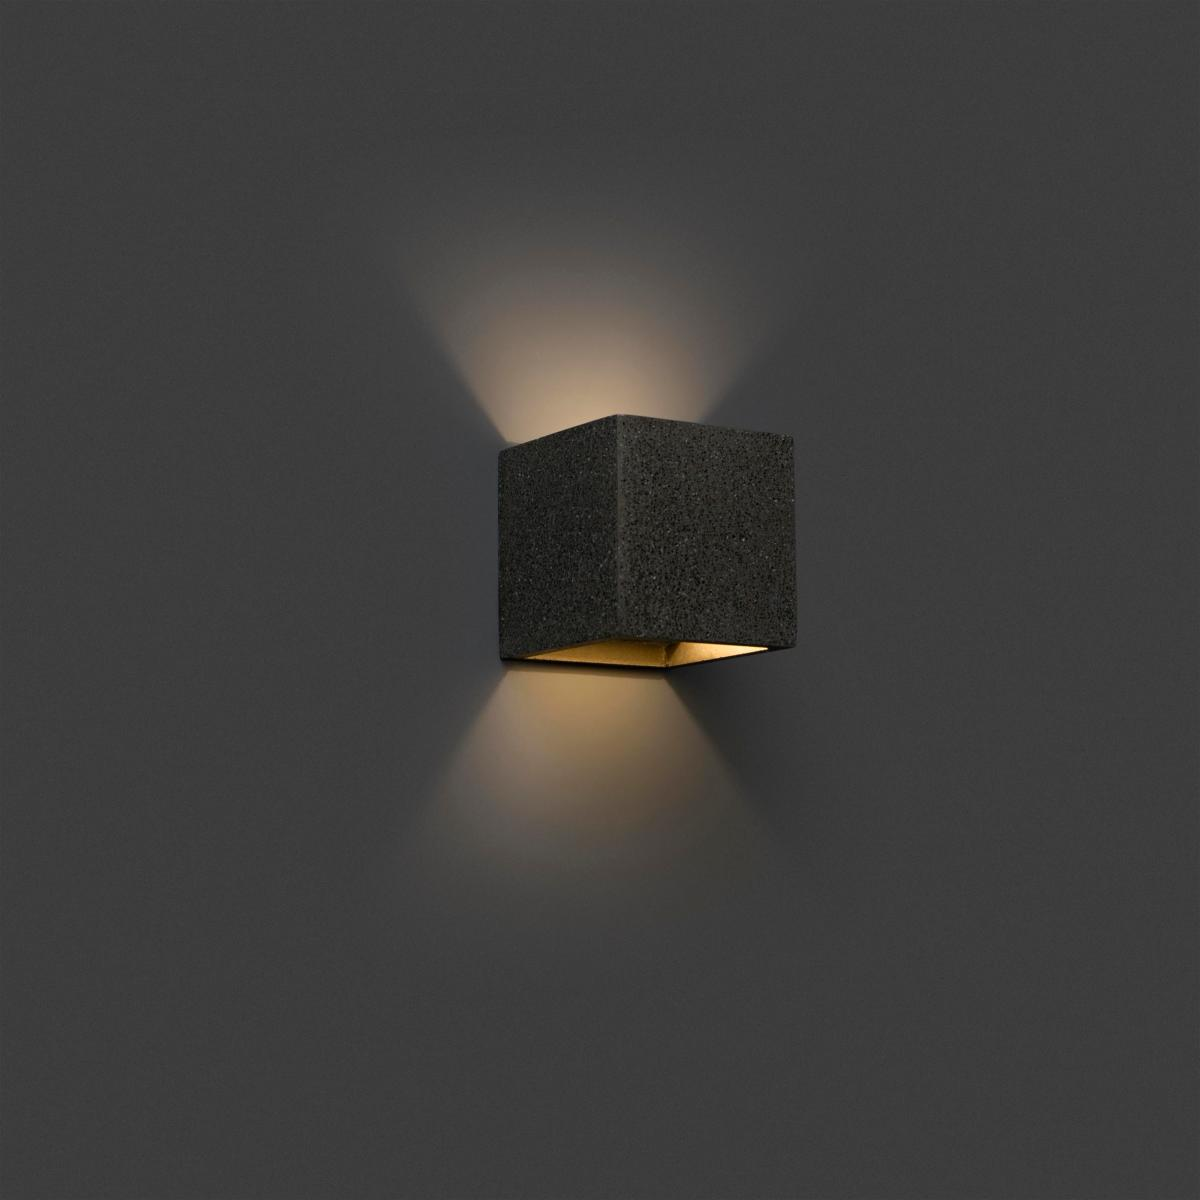 applique murale design b ton kamen faro 220v 63312. Black Bedroom Furniture Sets. Home Design Ideas